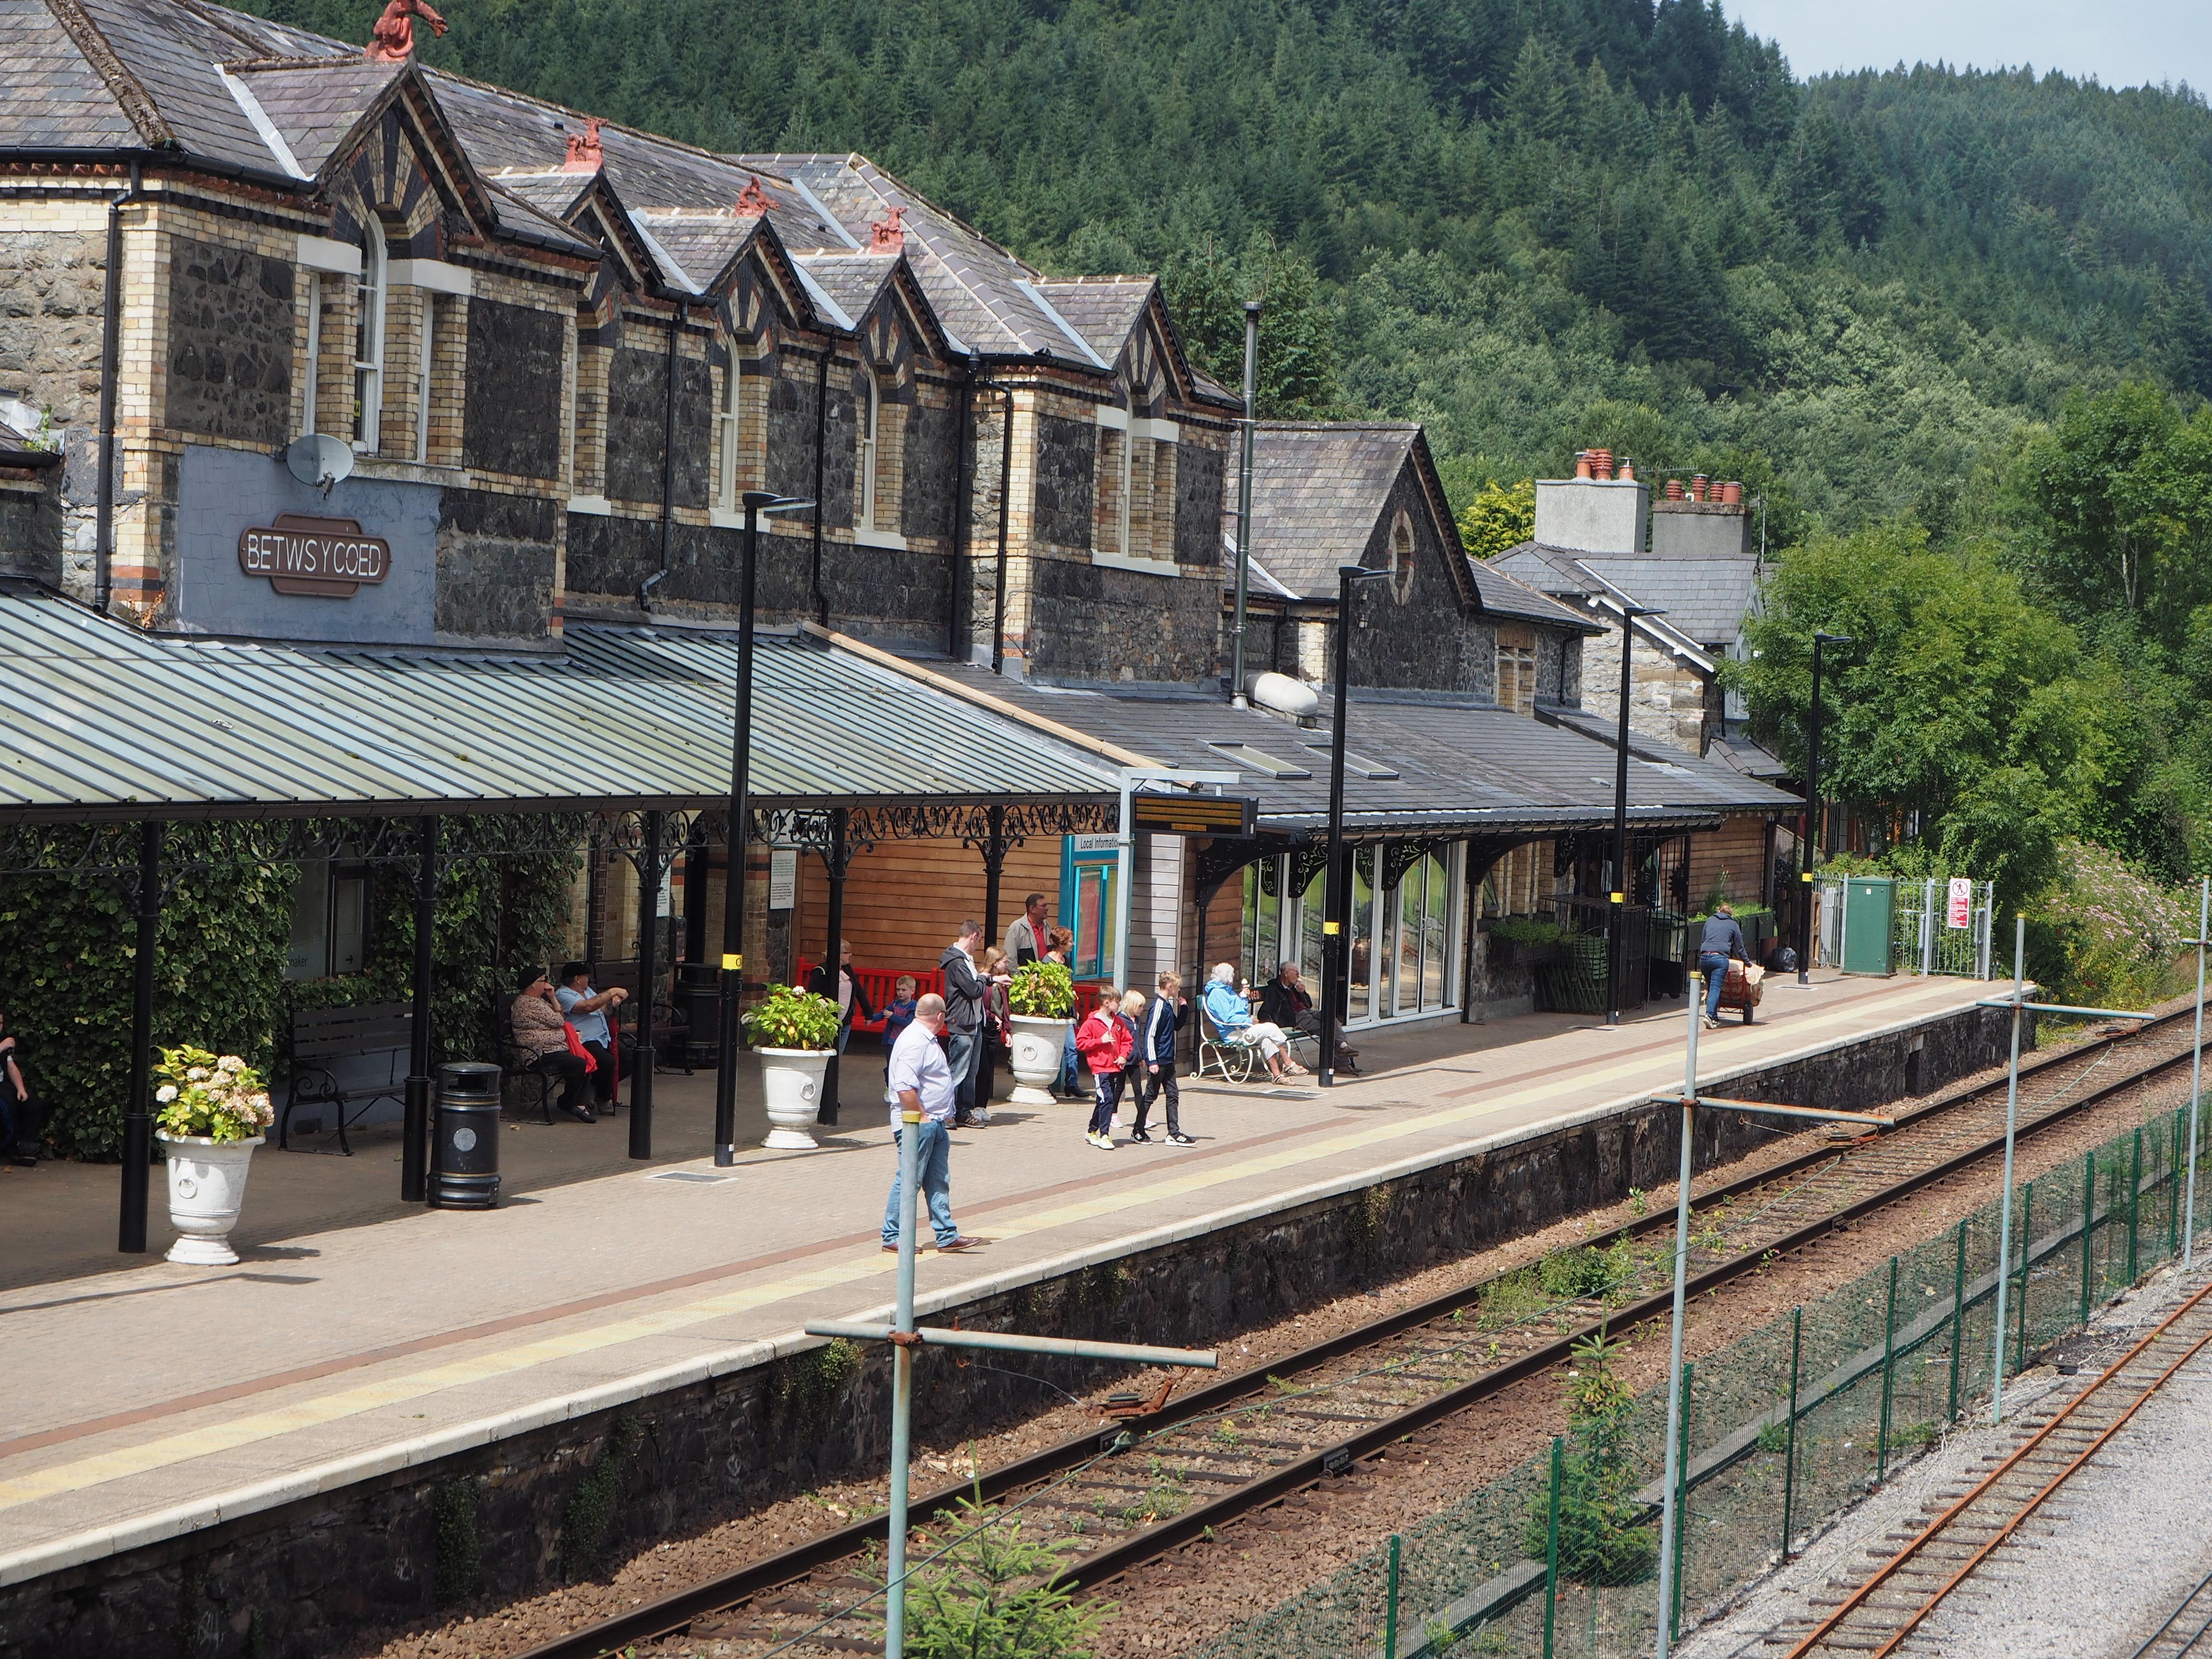 Betws y Coed Station, Conwy Valley Railway